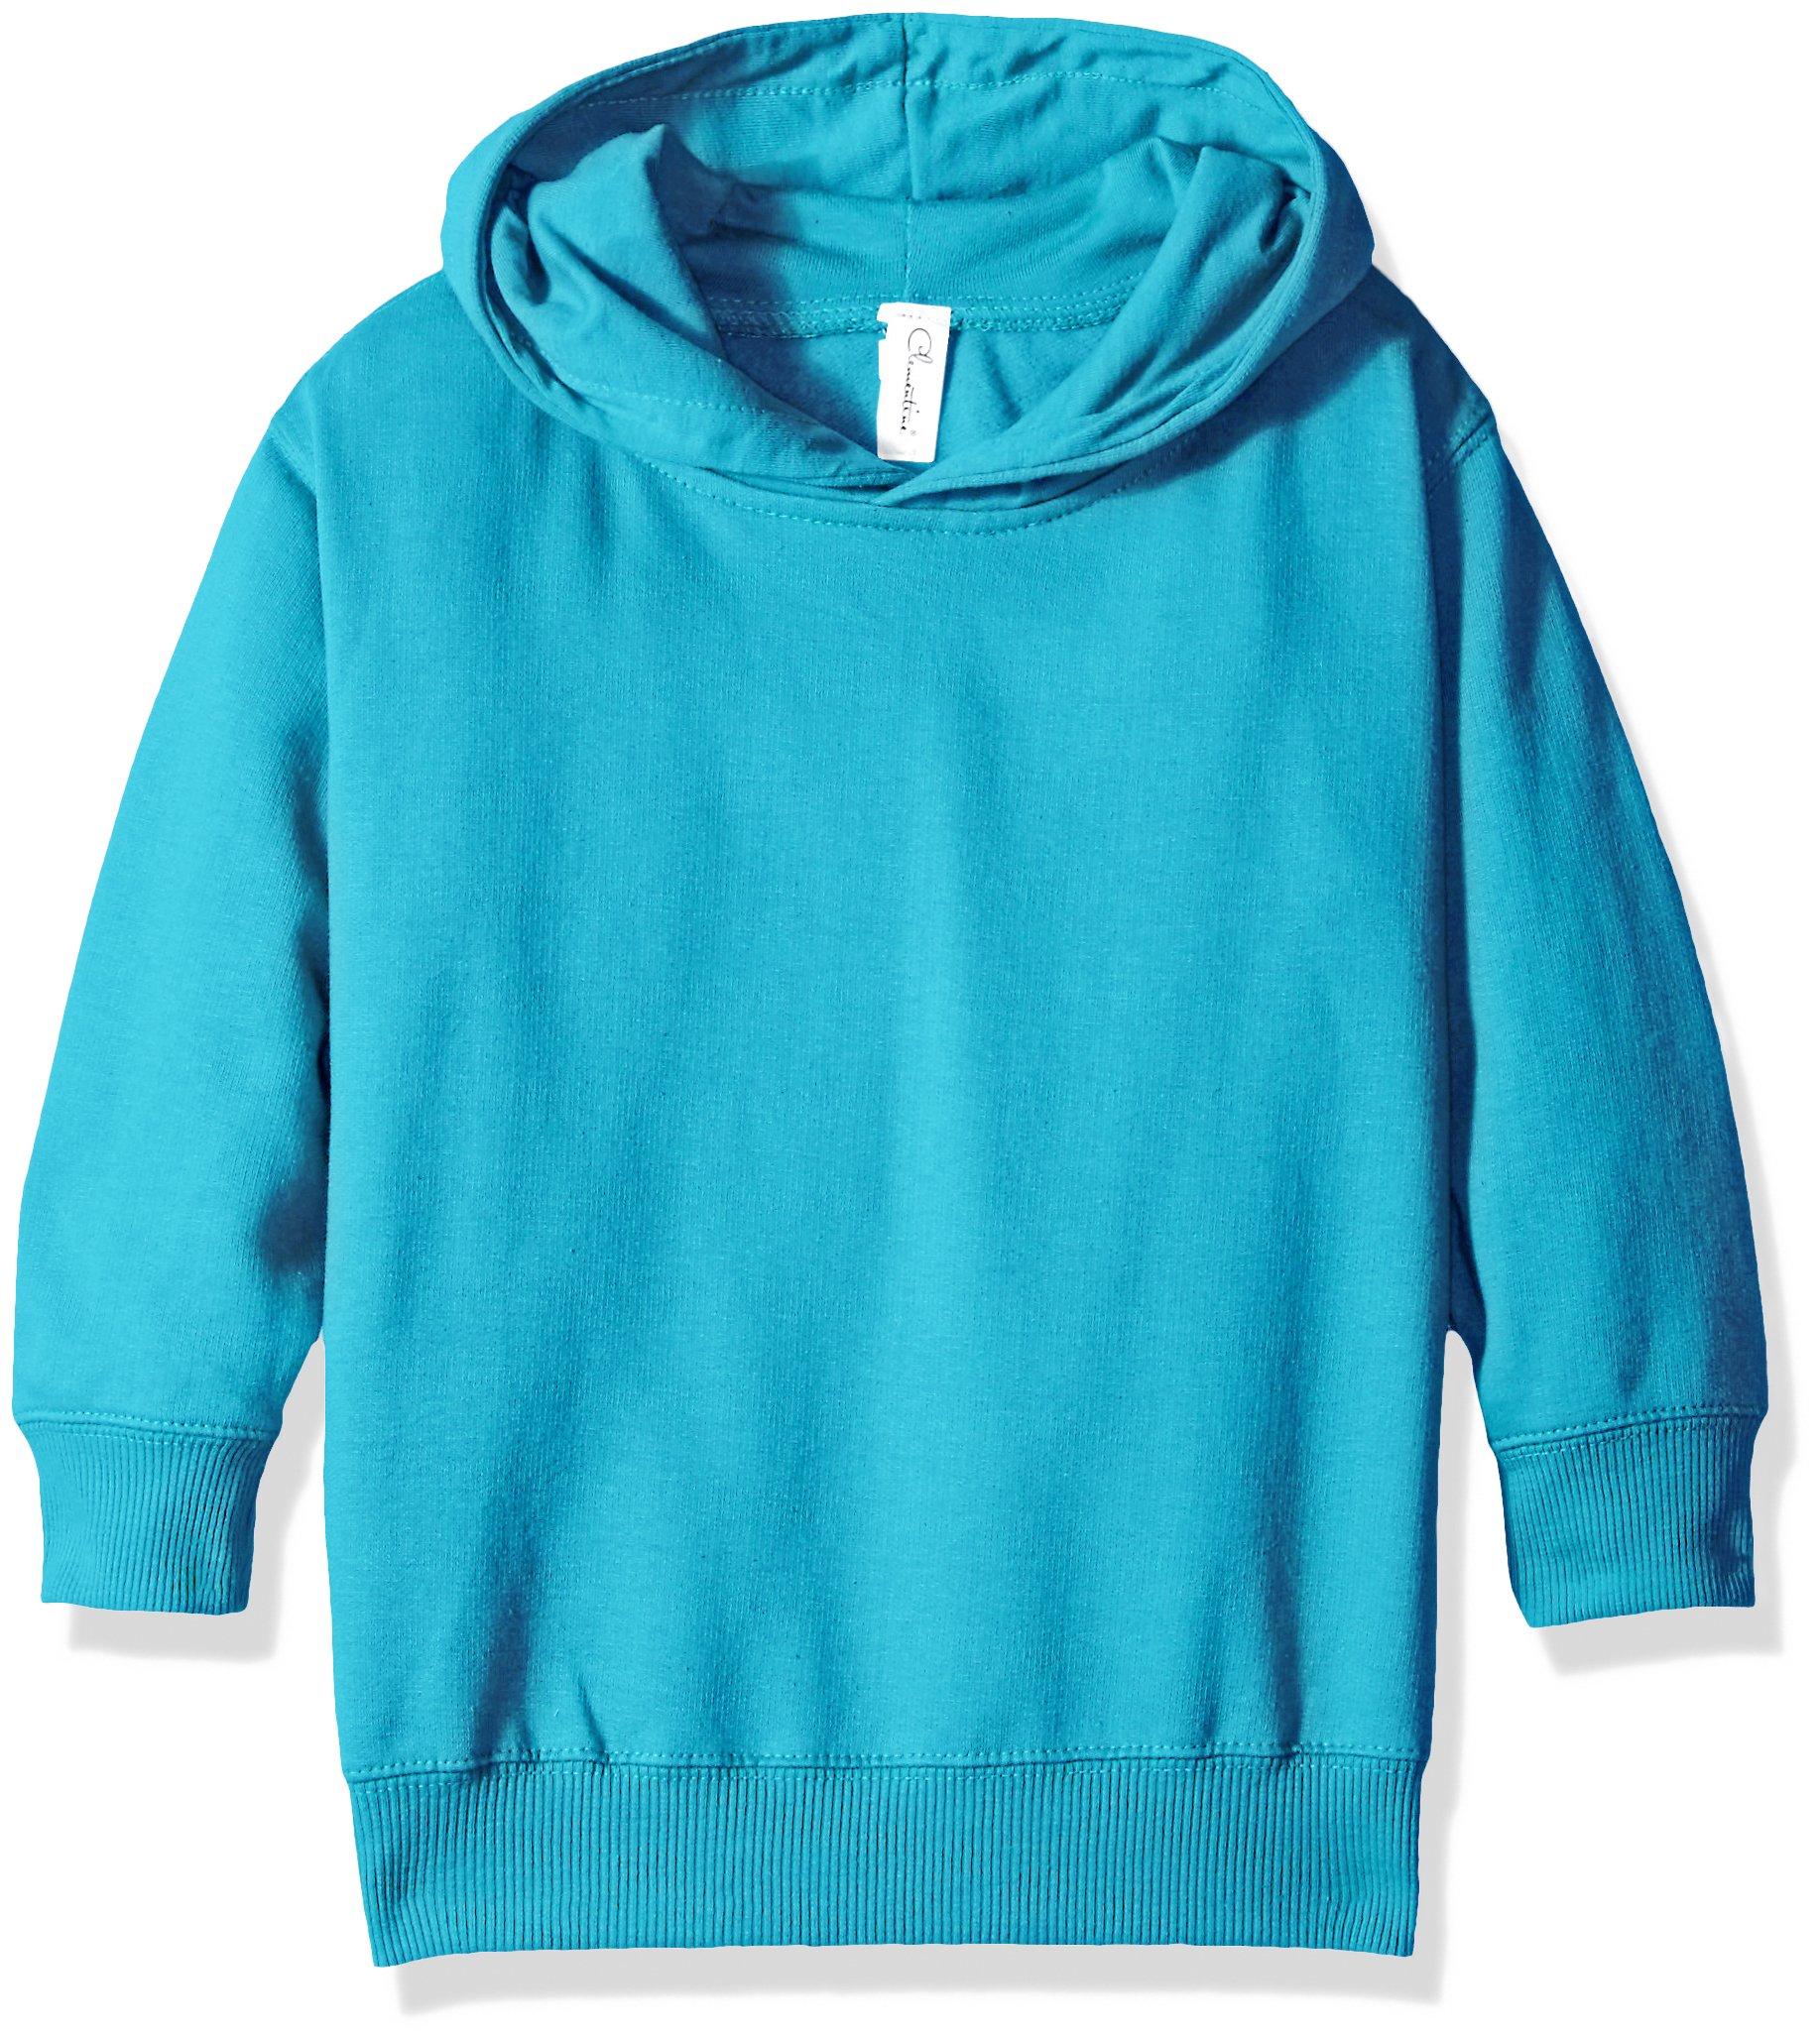 Apparel Toddlers Full-Zip Fleece Hooded Sweatshirt Clementine Girls Little 2-7